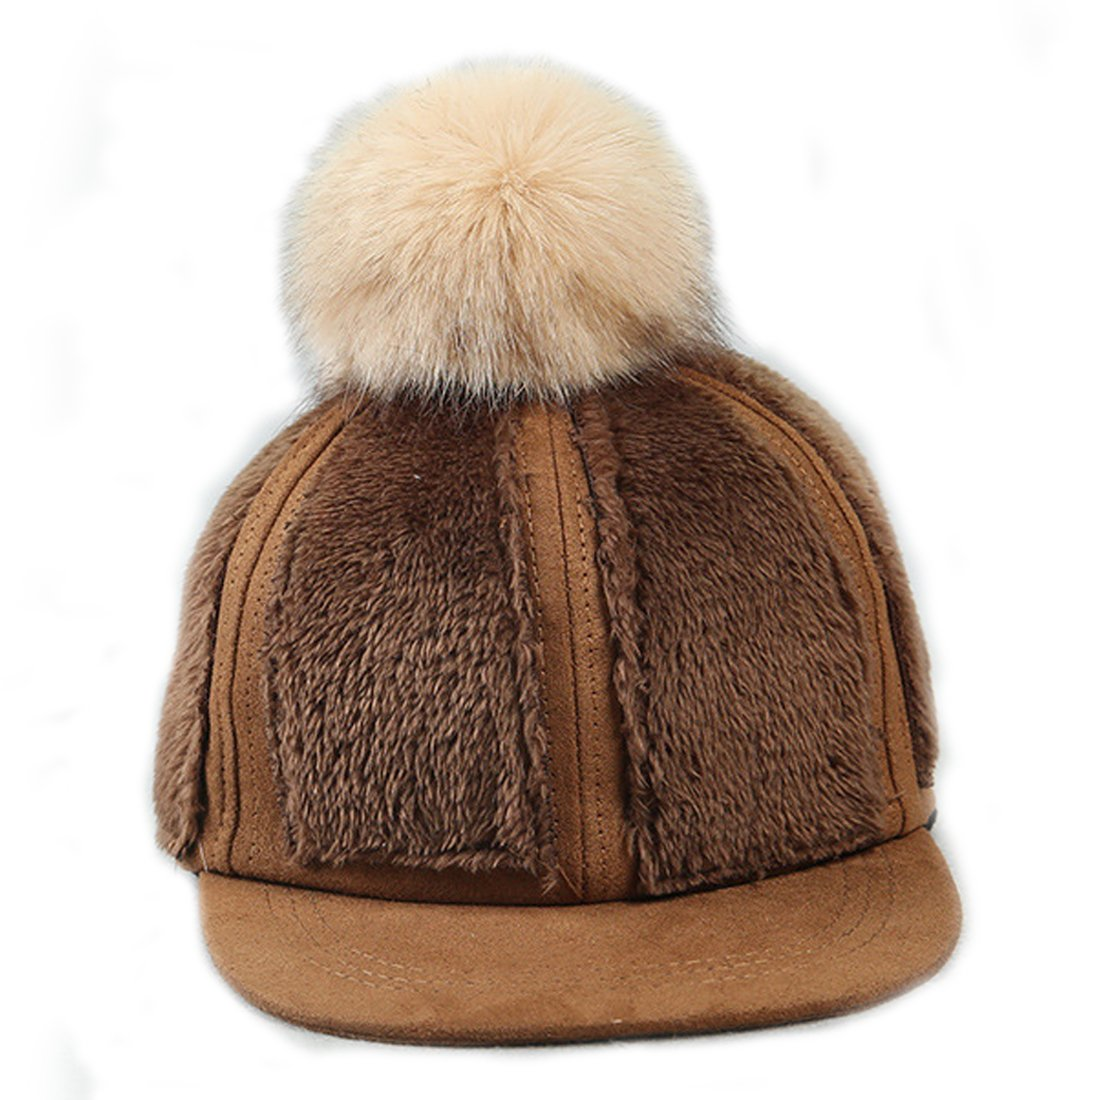 King Star Child Kids Boys Girls Fur Pom Pom Baseball Hat Hip-hop Cap Winter Hat Coffee